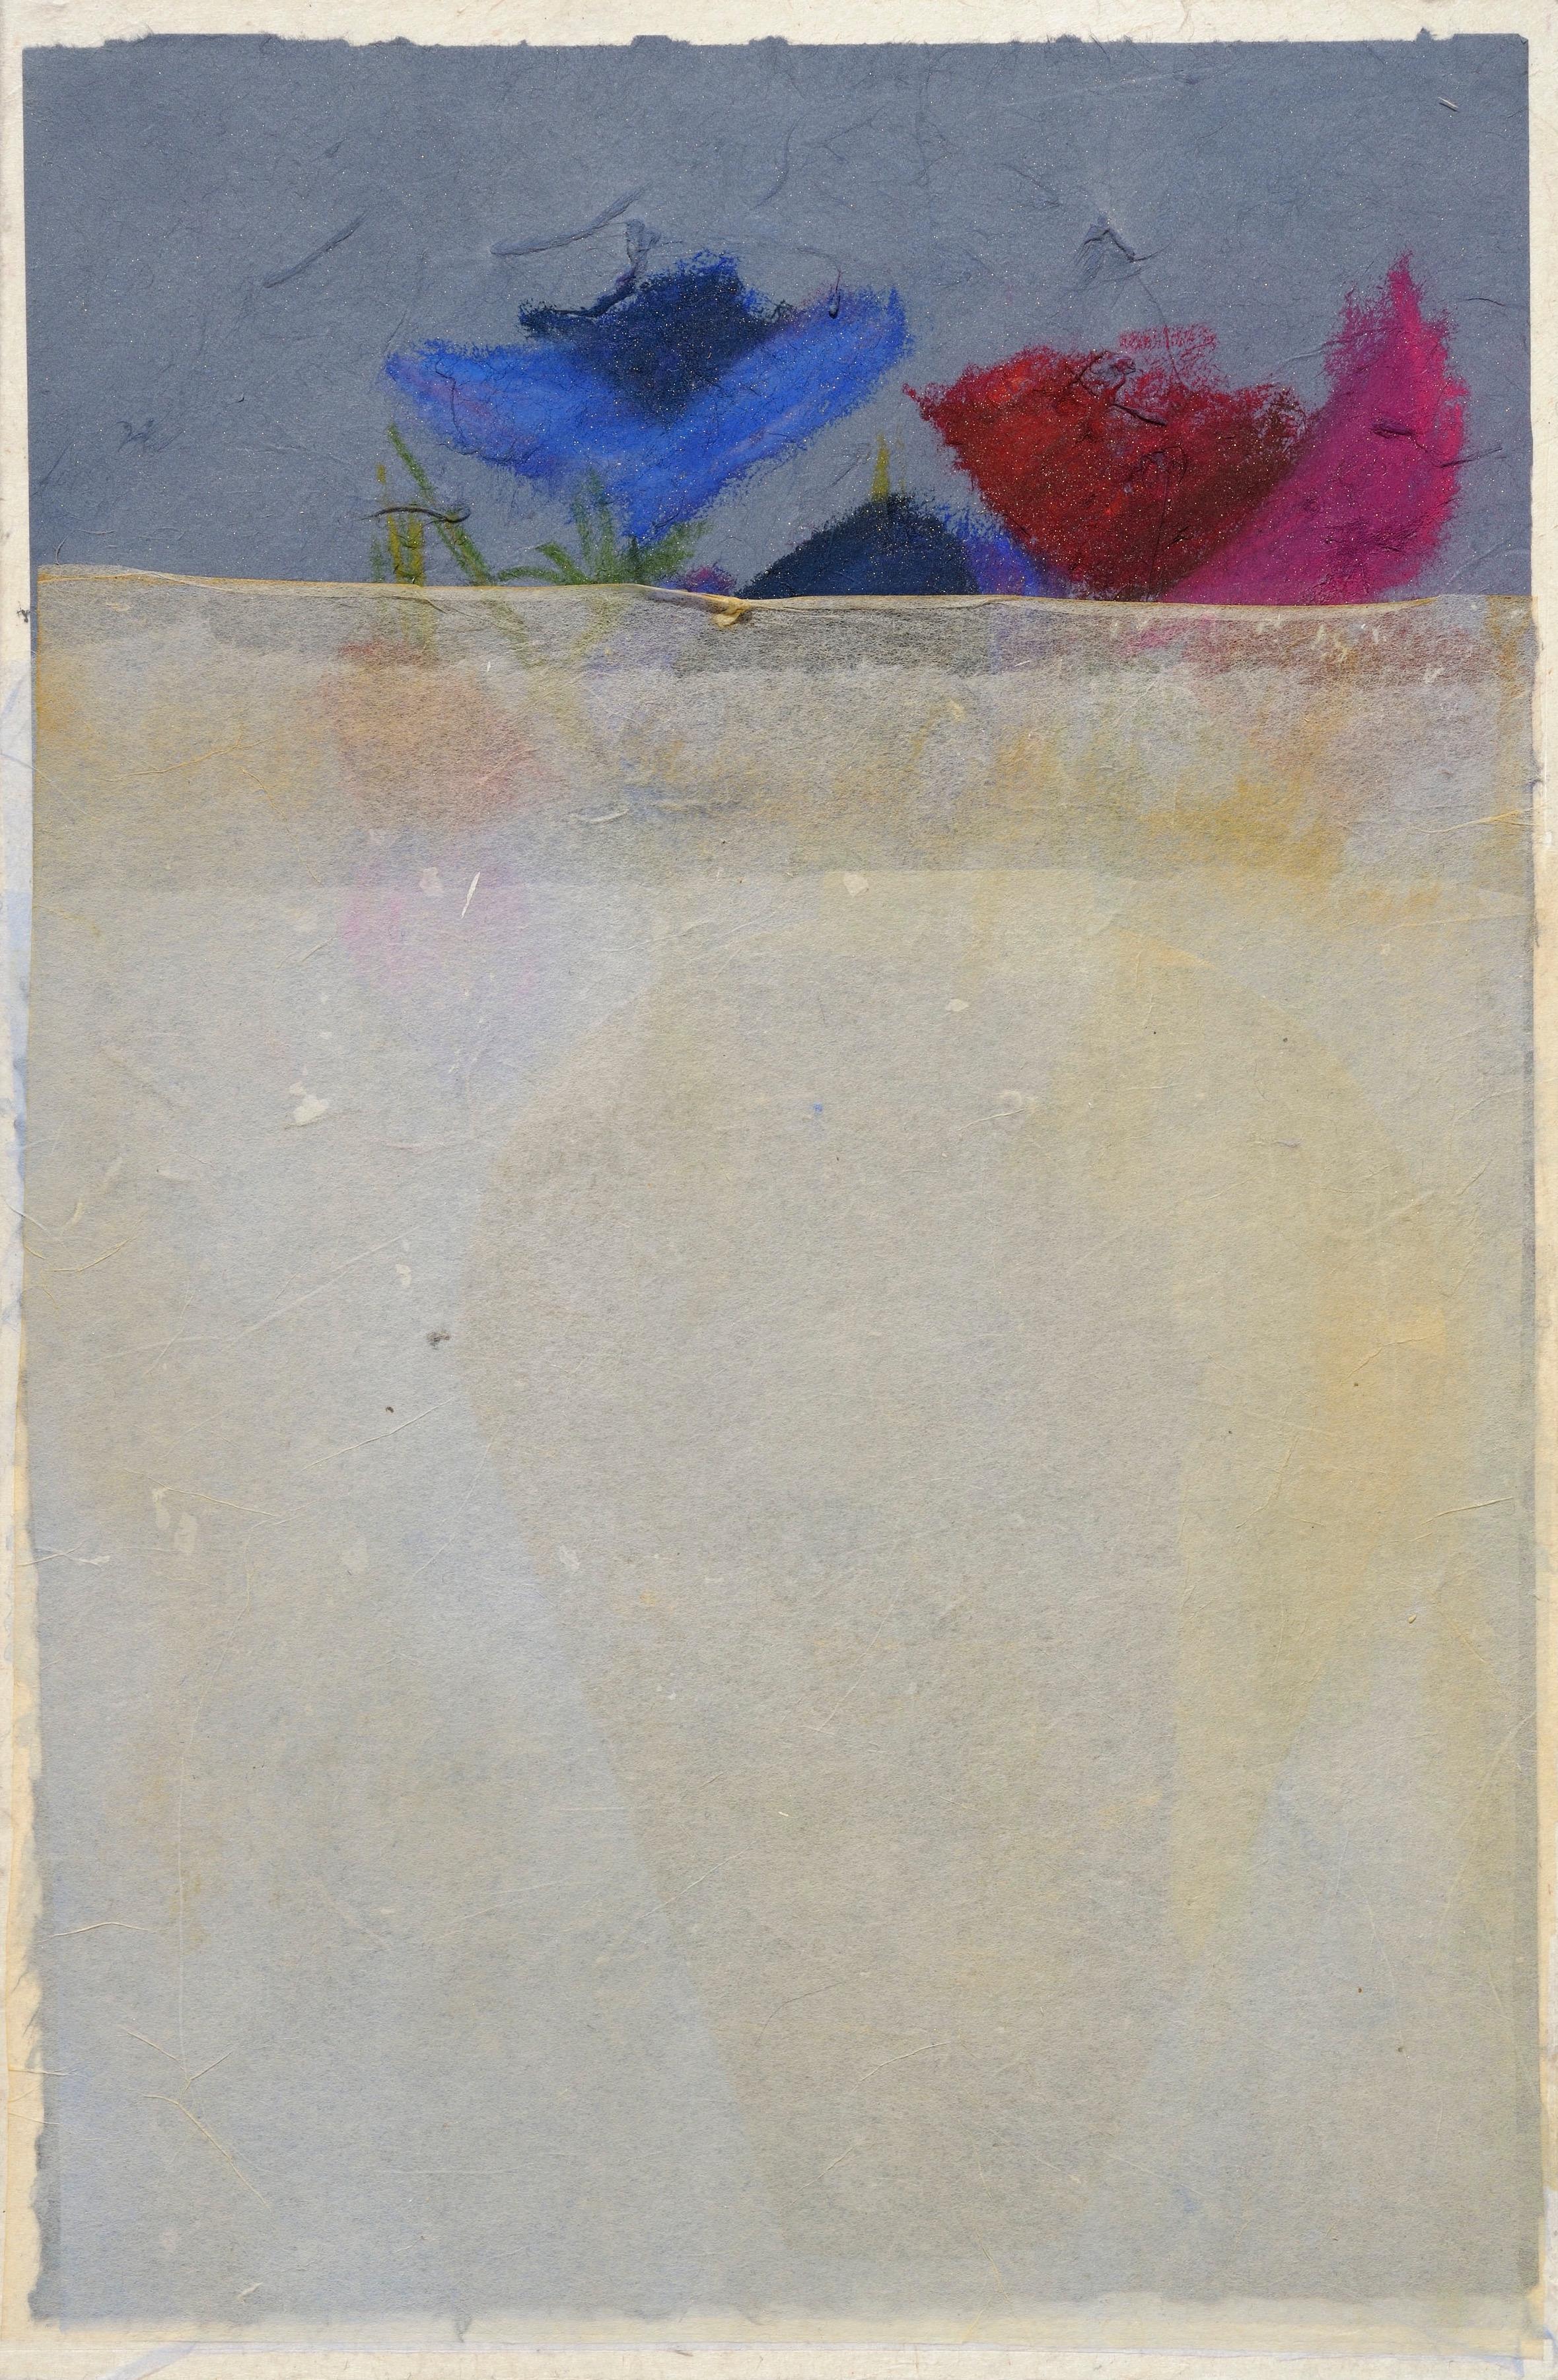 22_Veil - Wind Flowers_38x25cm.jpg